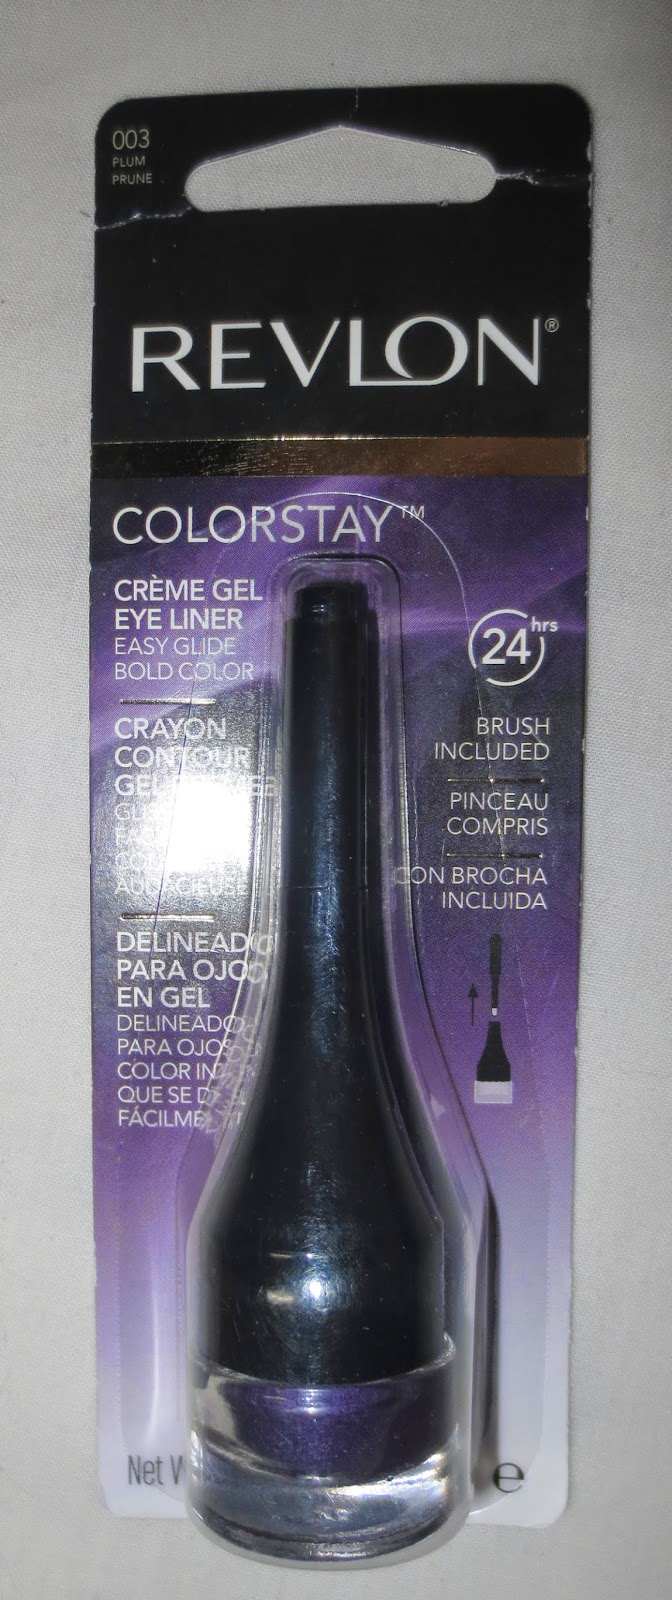 Revlon ColorStay Crème Gel Eyeliner in Plum